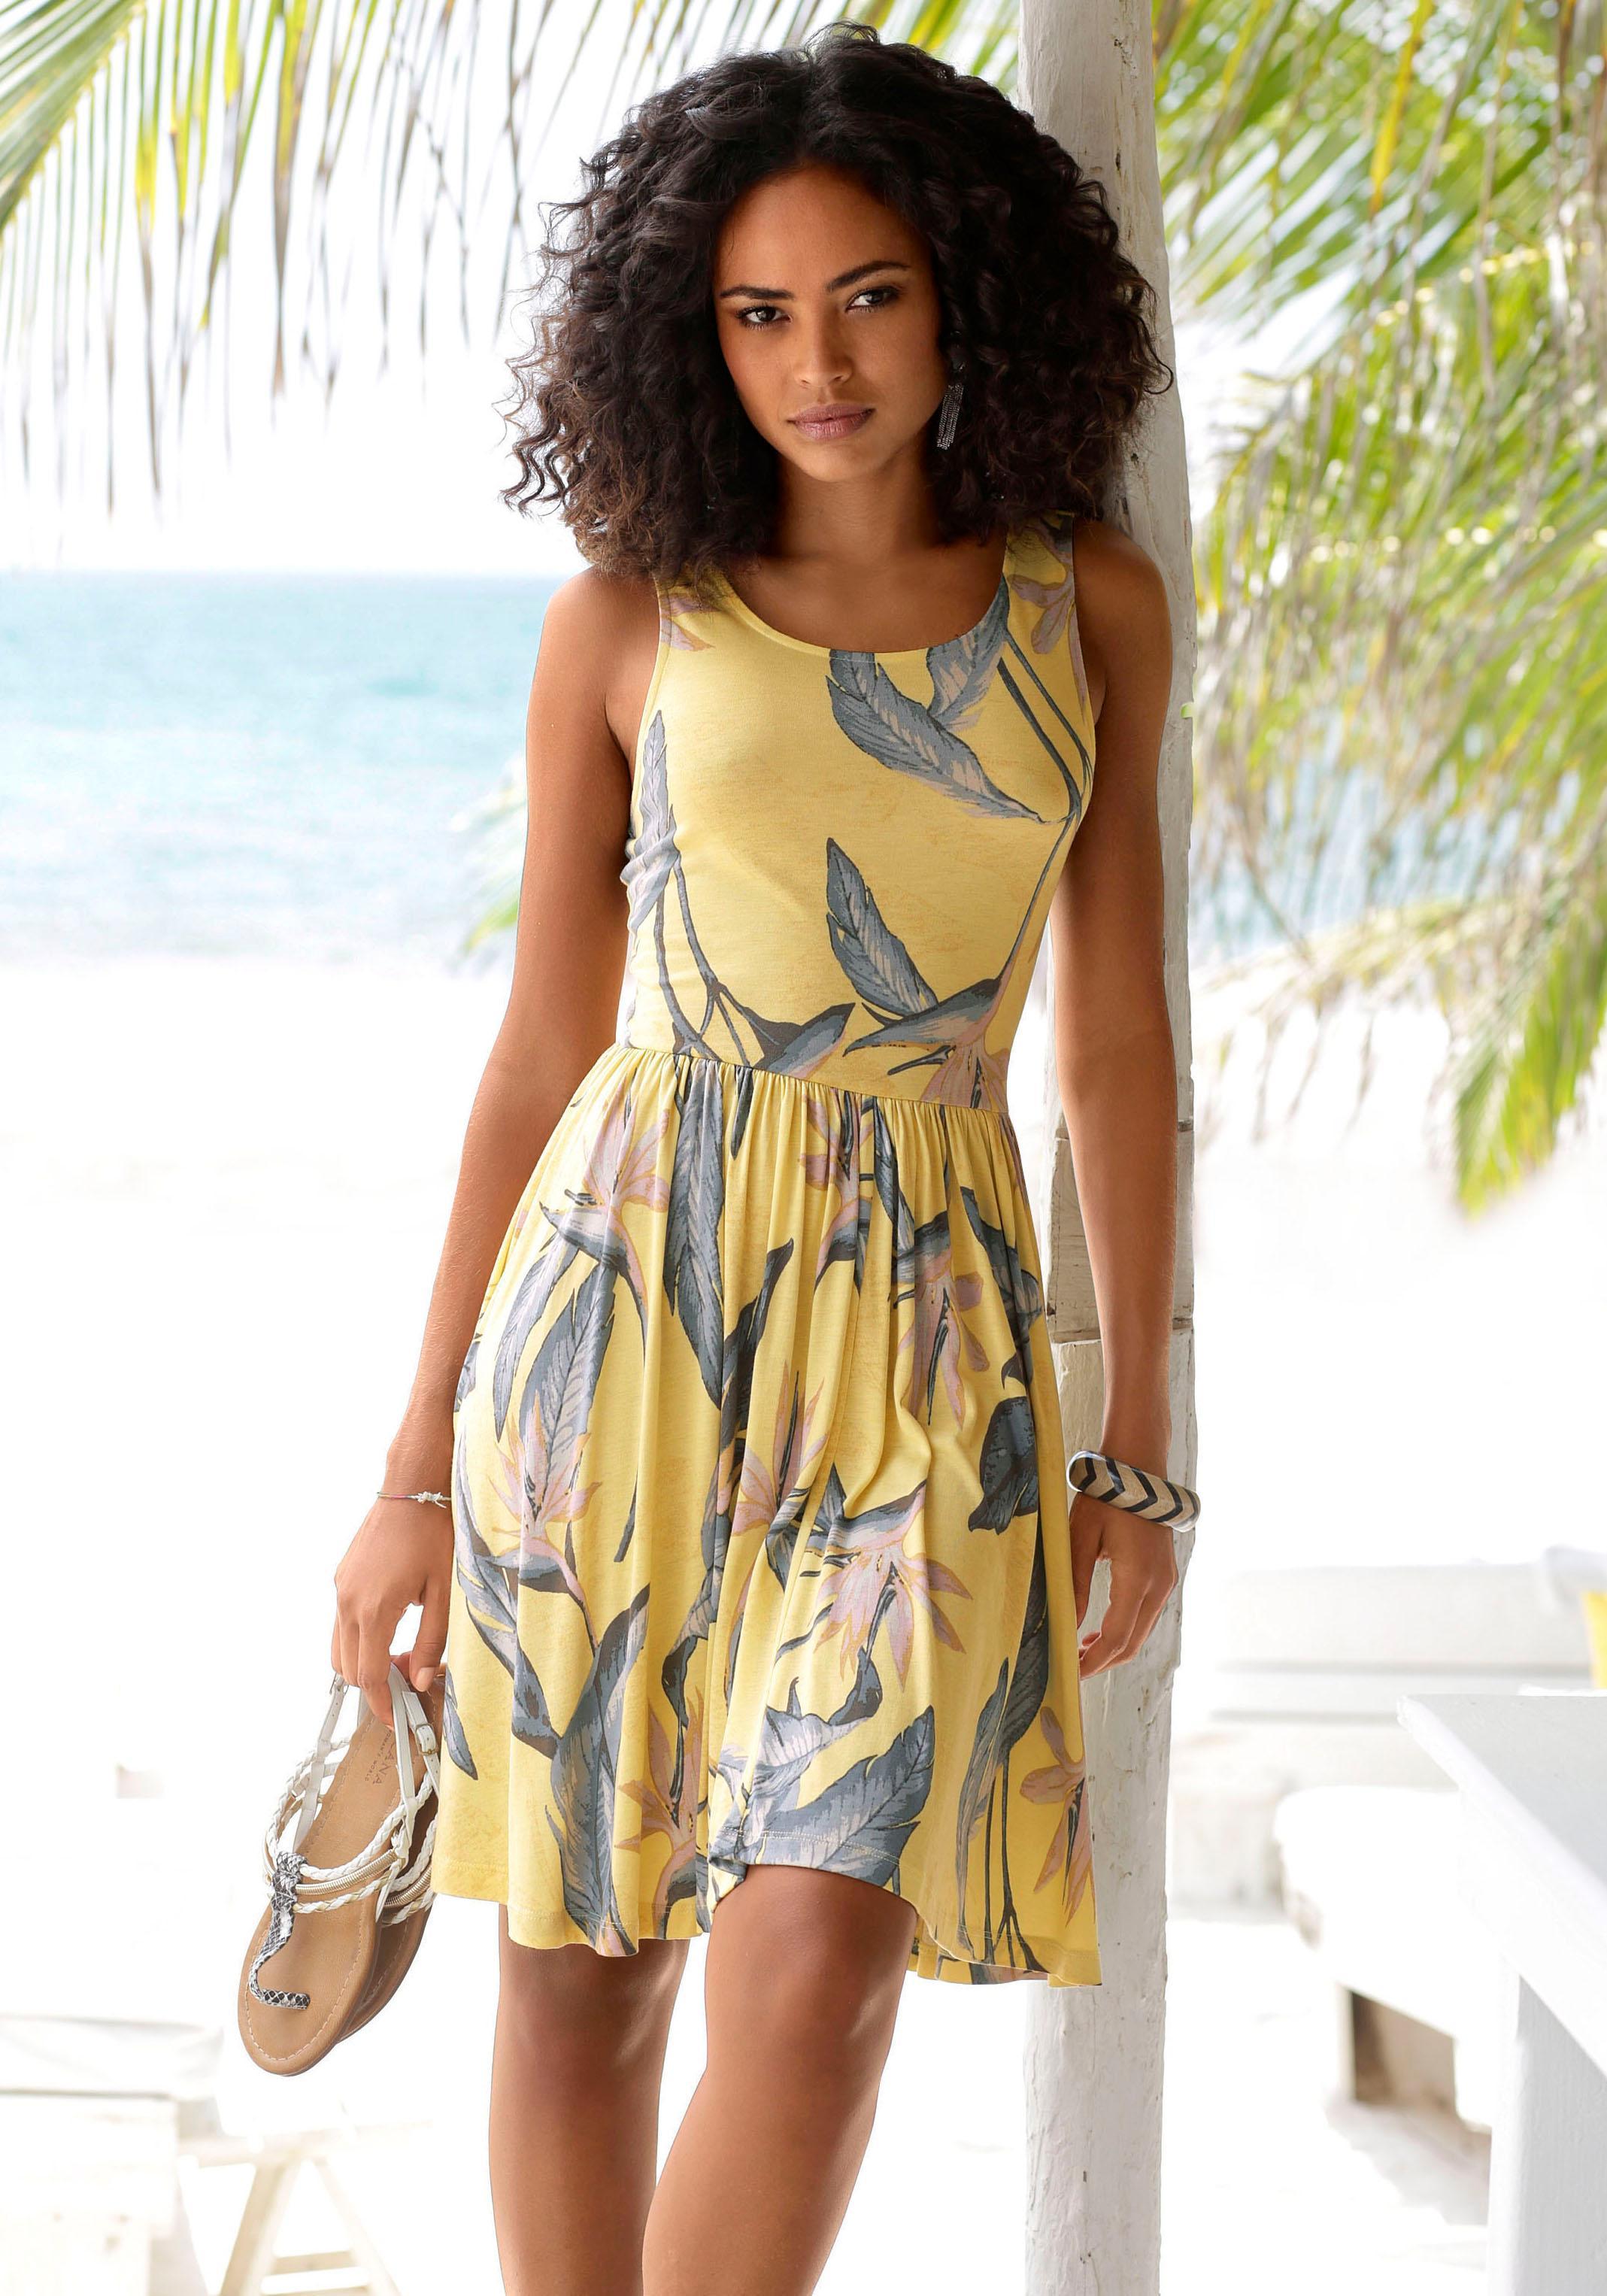 Beachtime Strandkleid mit gerafftem Rockteil